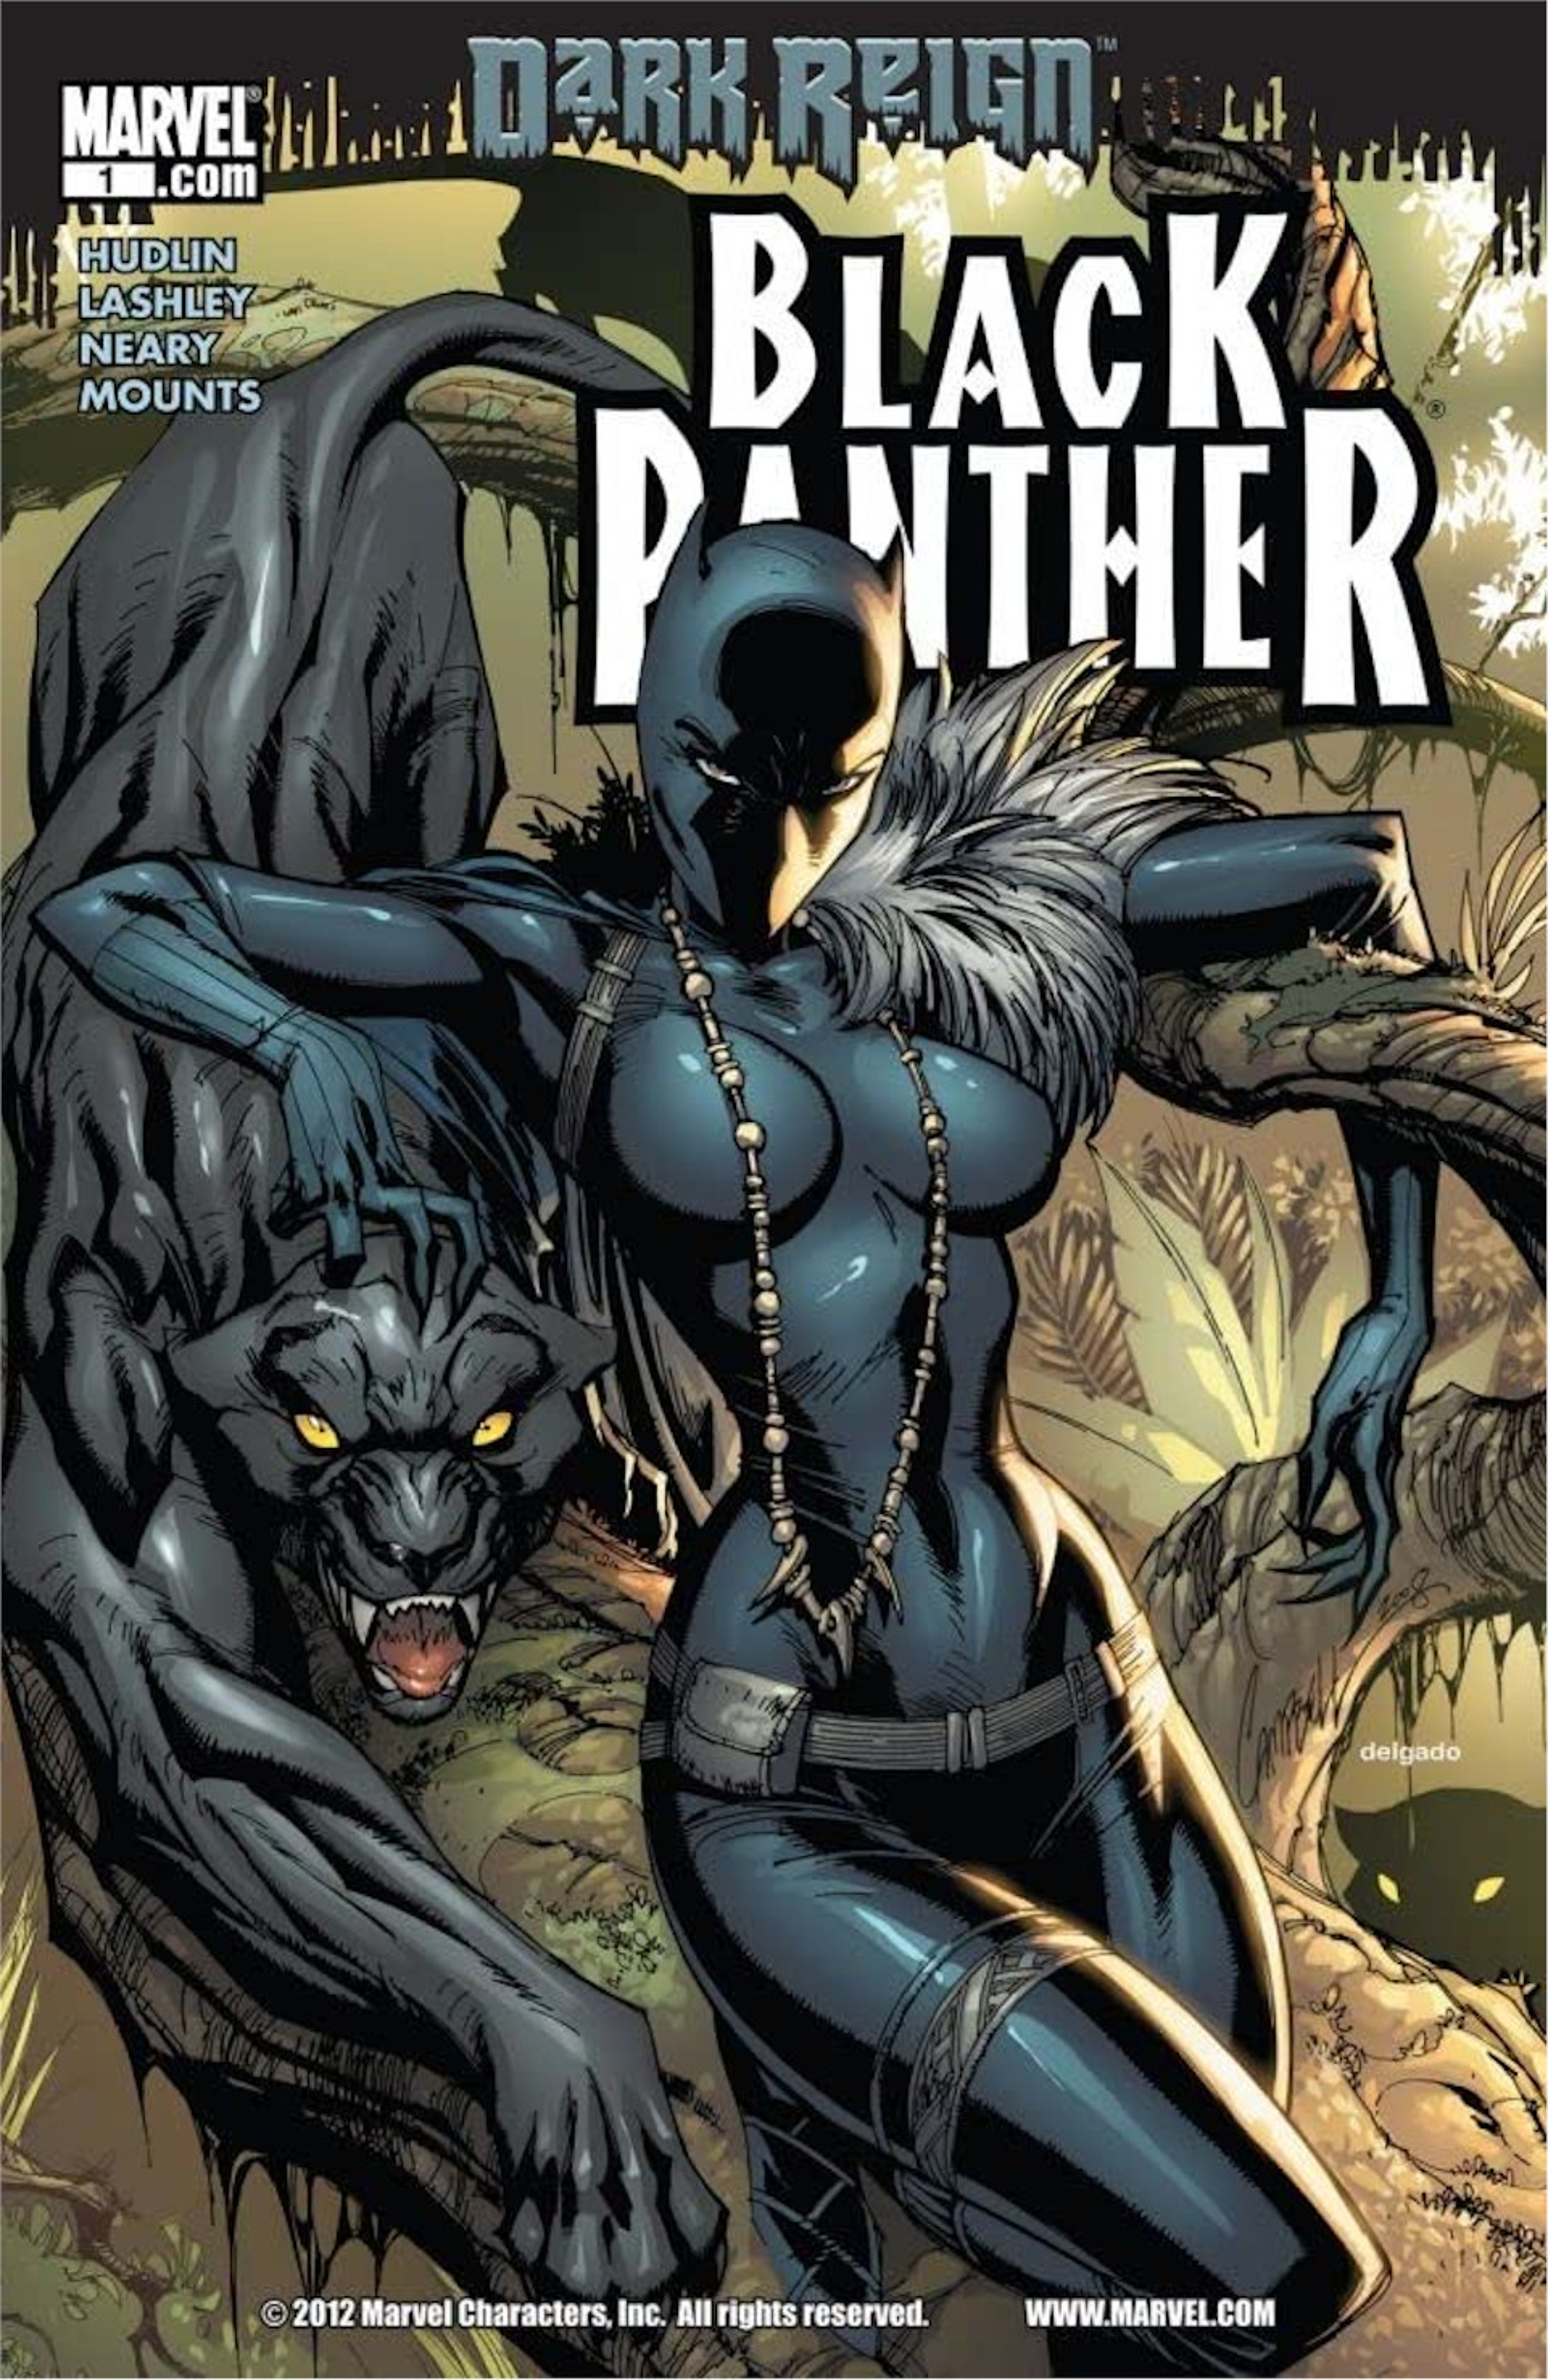 Black Panther Vol 5 1 - Marvel Comics Database